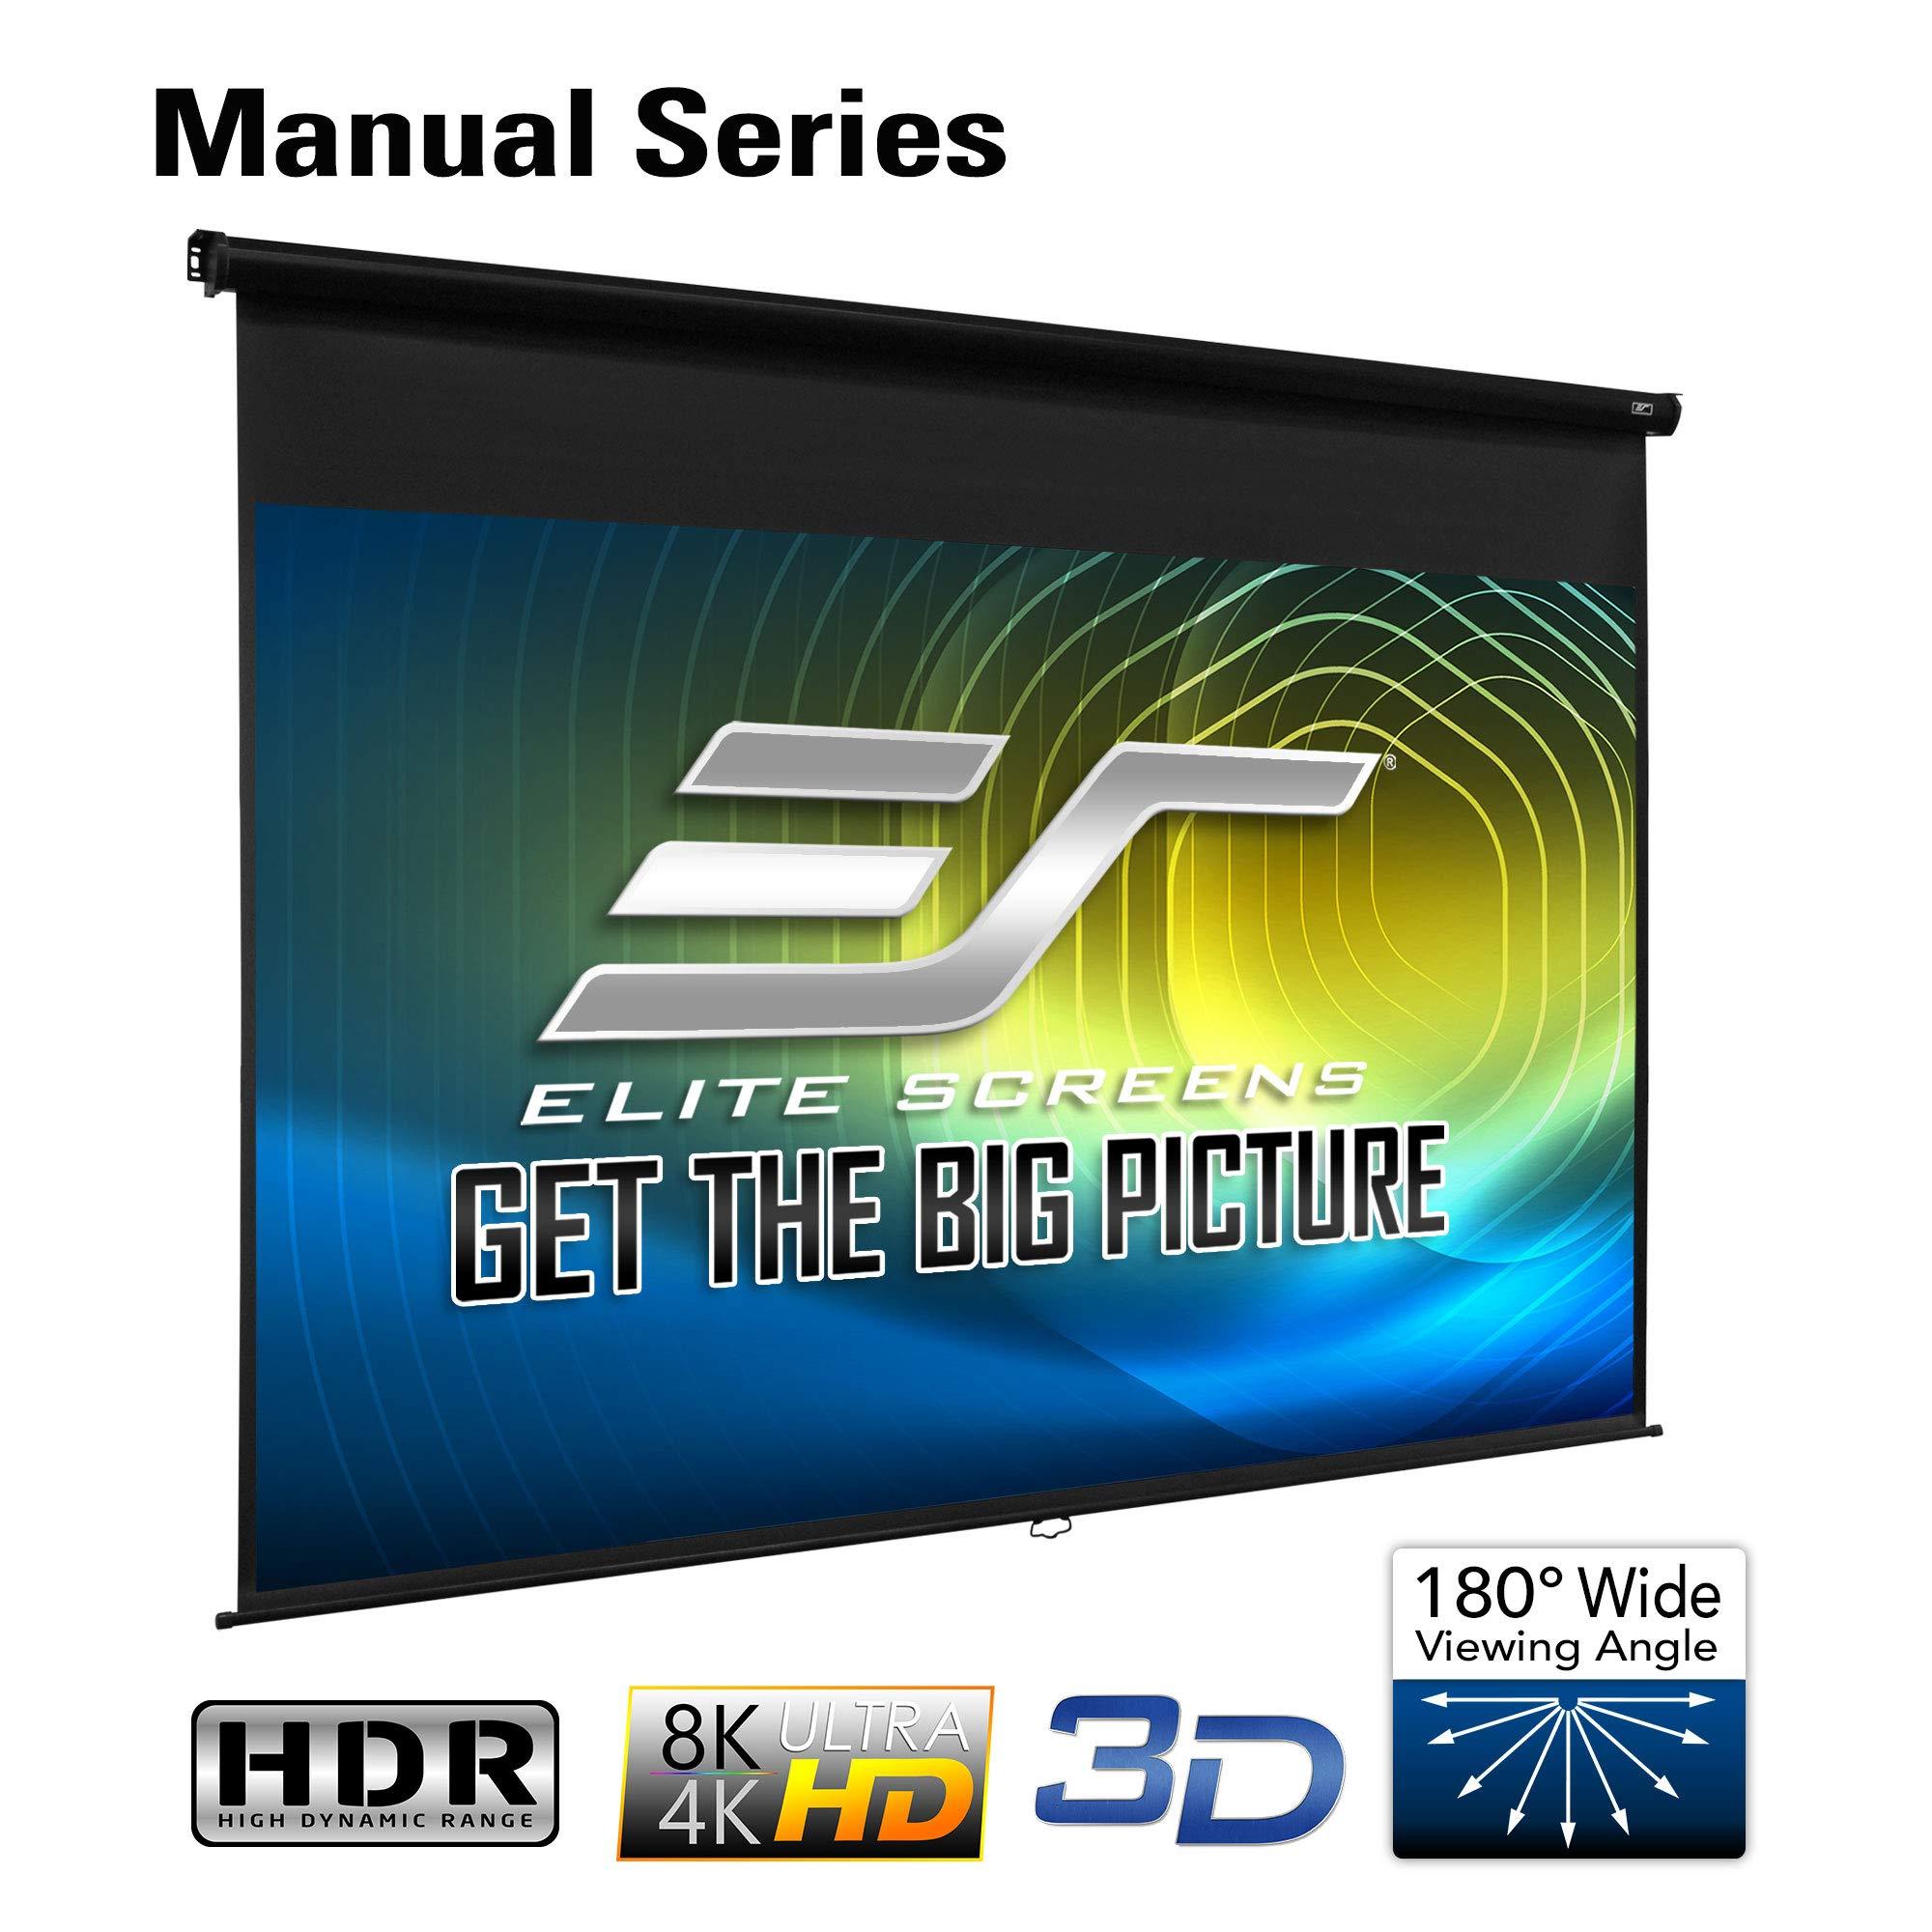 Elite Screens Manual Series, 86-INCH 16:10, Pull Down Manual Projector Screen with AUTO LOCK, Movie Home Theater 8K / 4K Ultra HD 3D Ready, 2-YEAR WARRANTY, M86UWX, 16:10, Black